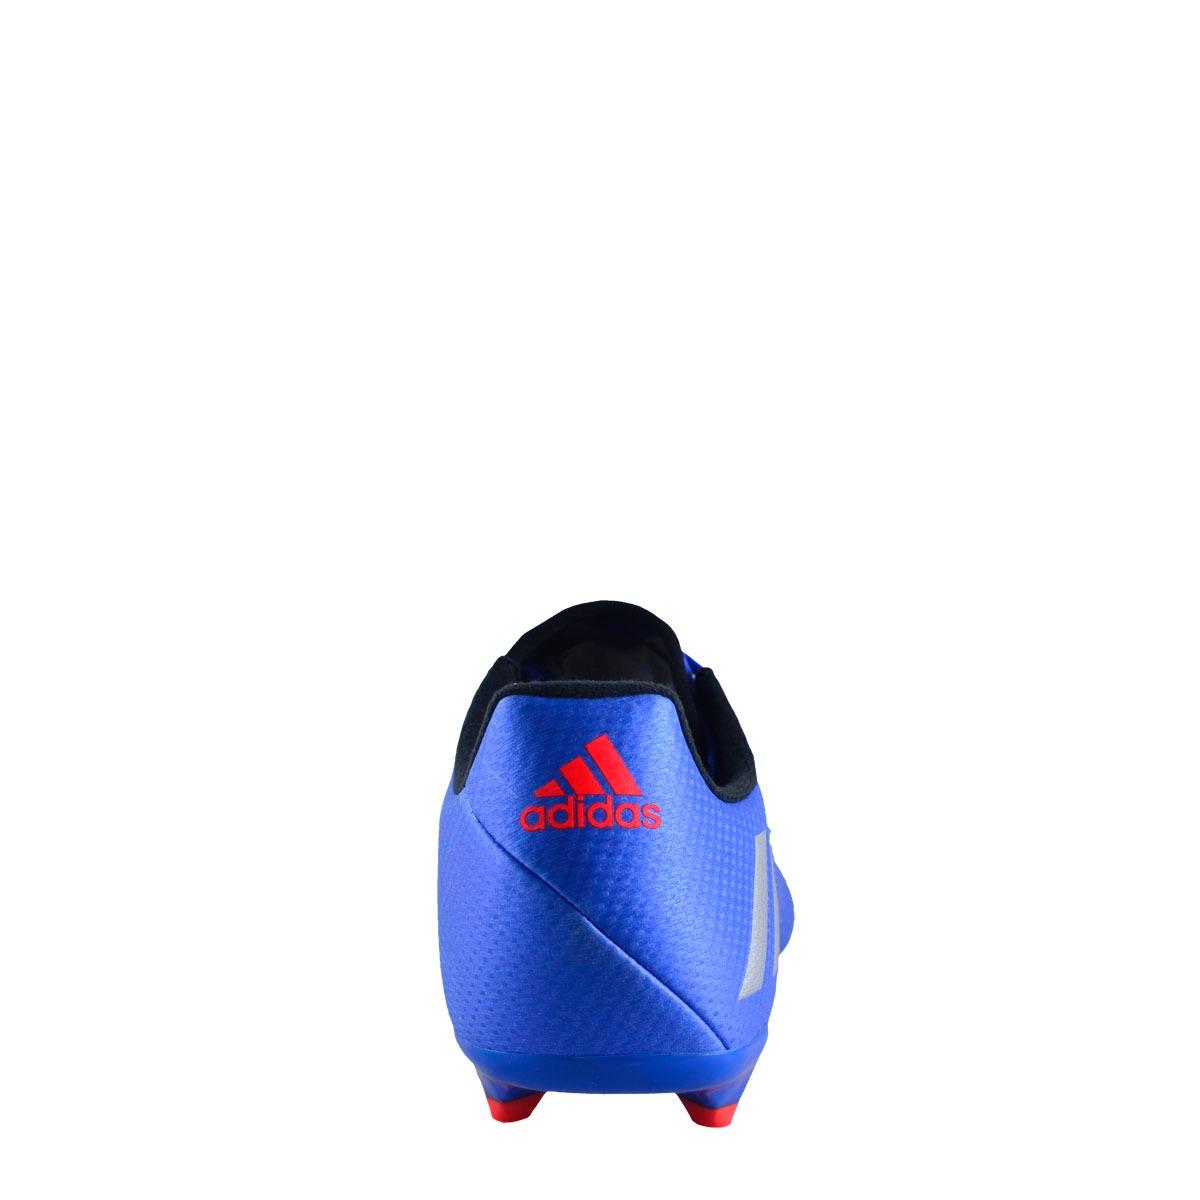 b3d8cdafc9973 botines adidas messi 16.3 suelo firme hombre azul. Cargando zoom.